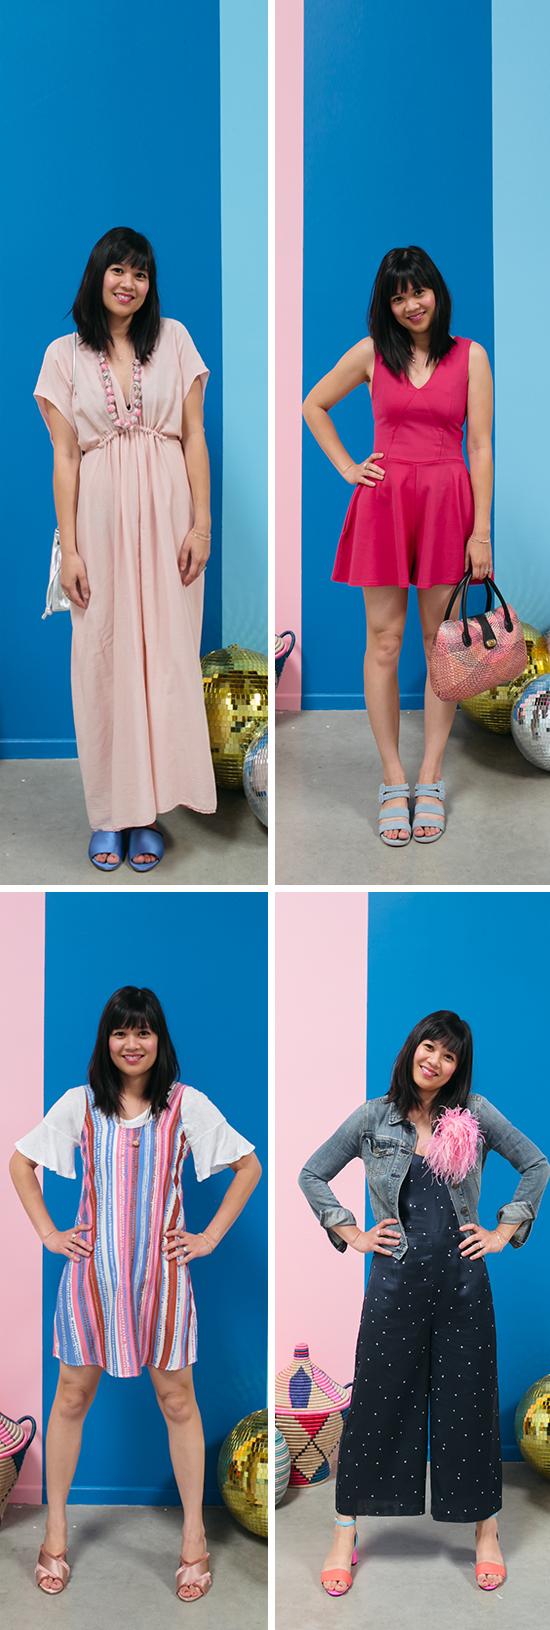 2017_06_20_June-Pink-Blue-Outfits20-GRID-BLOG